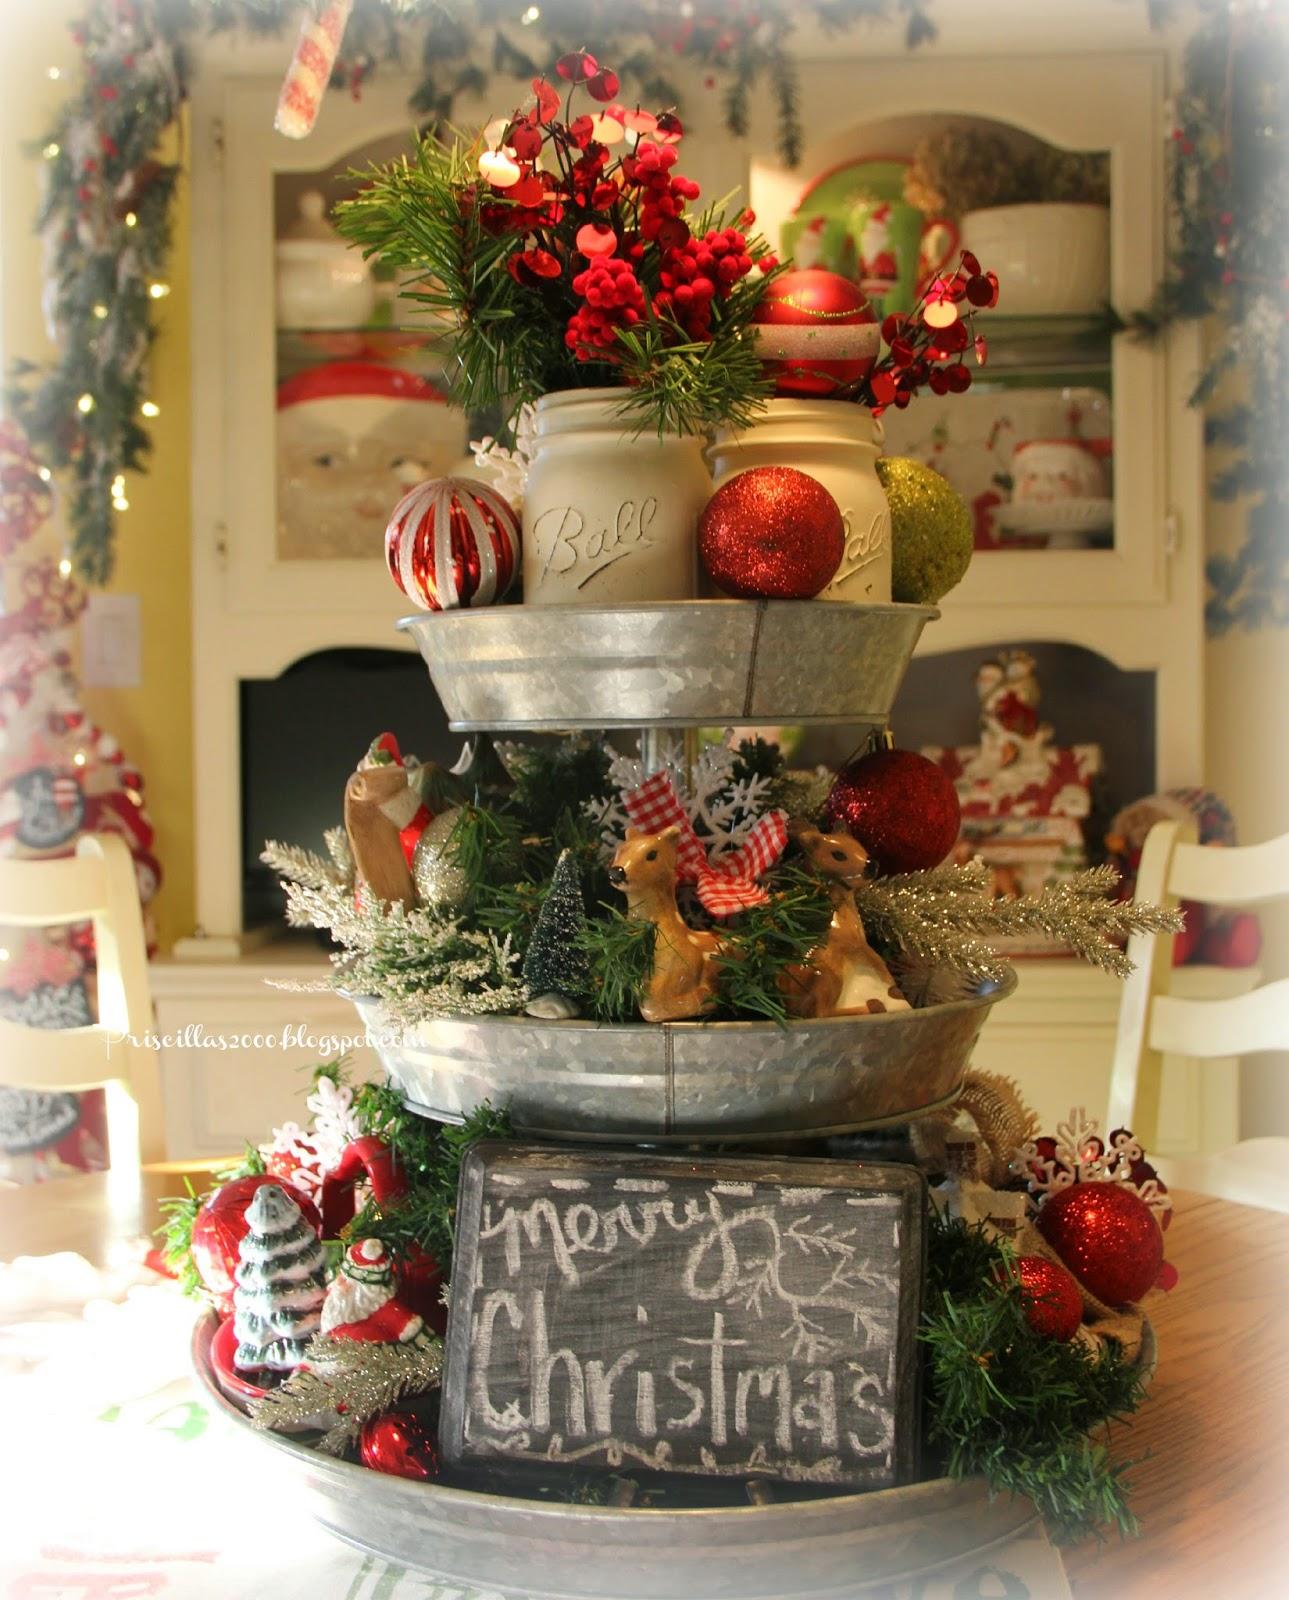 Priscillas christmas galvanized tray centerpiece